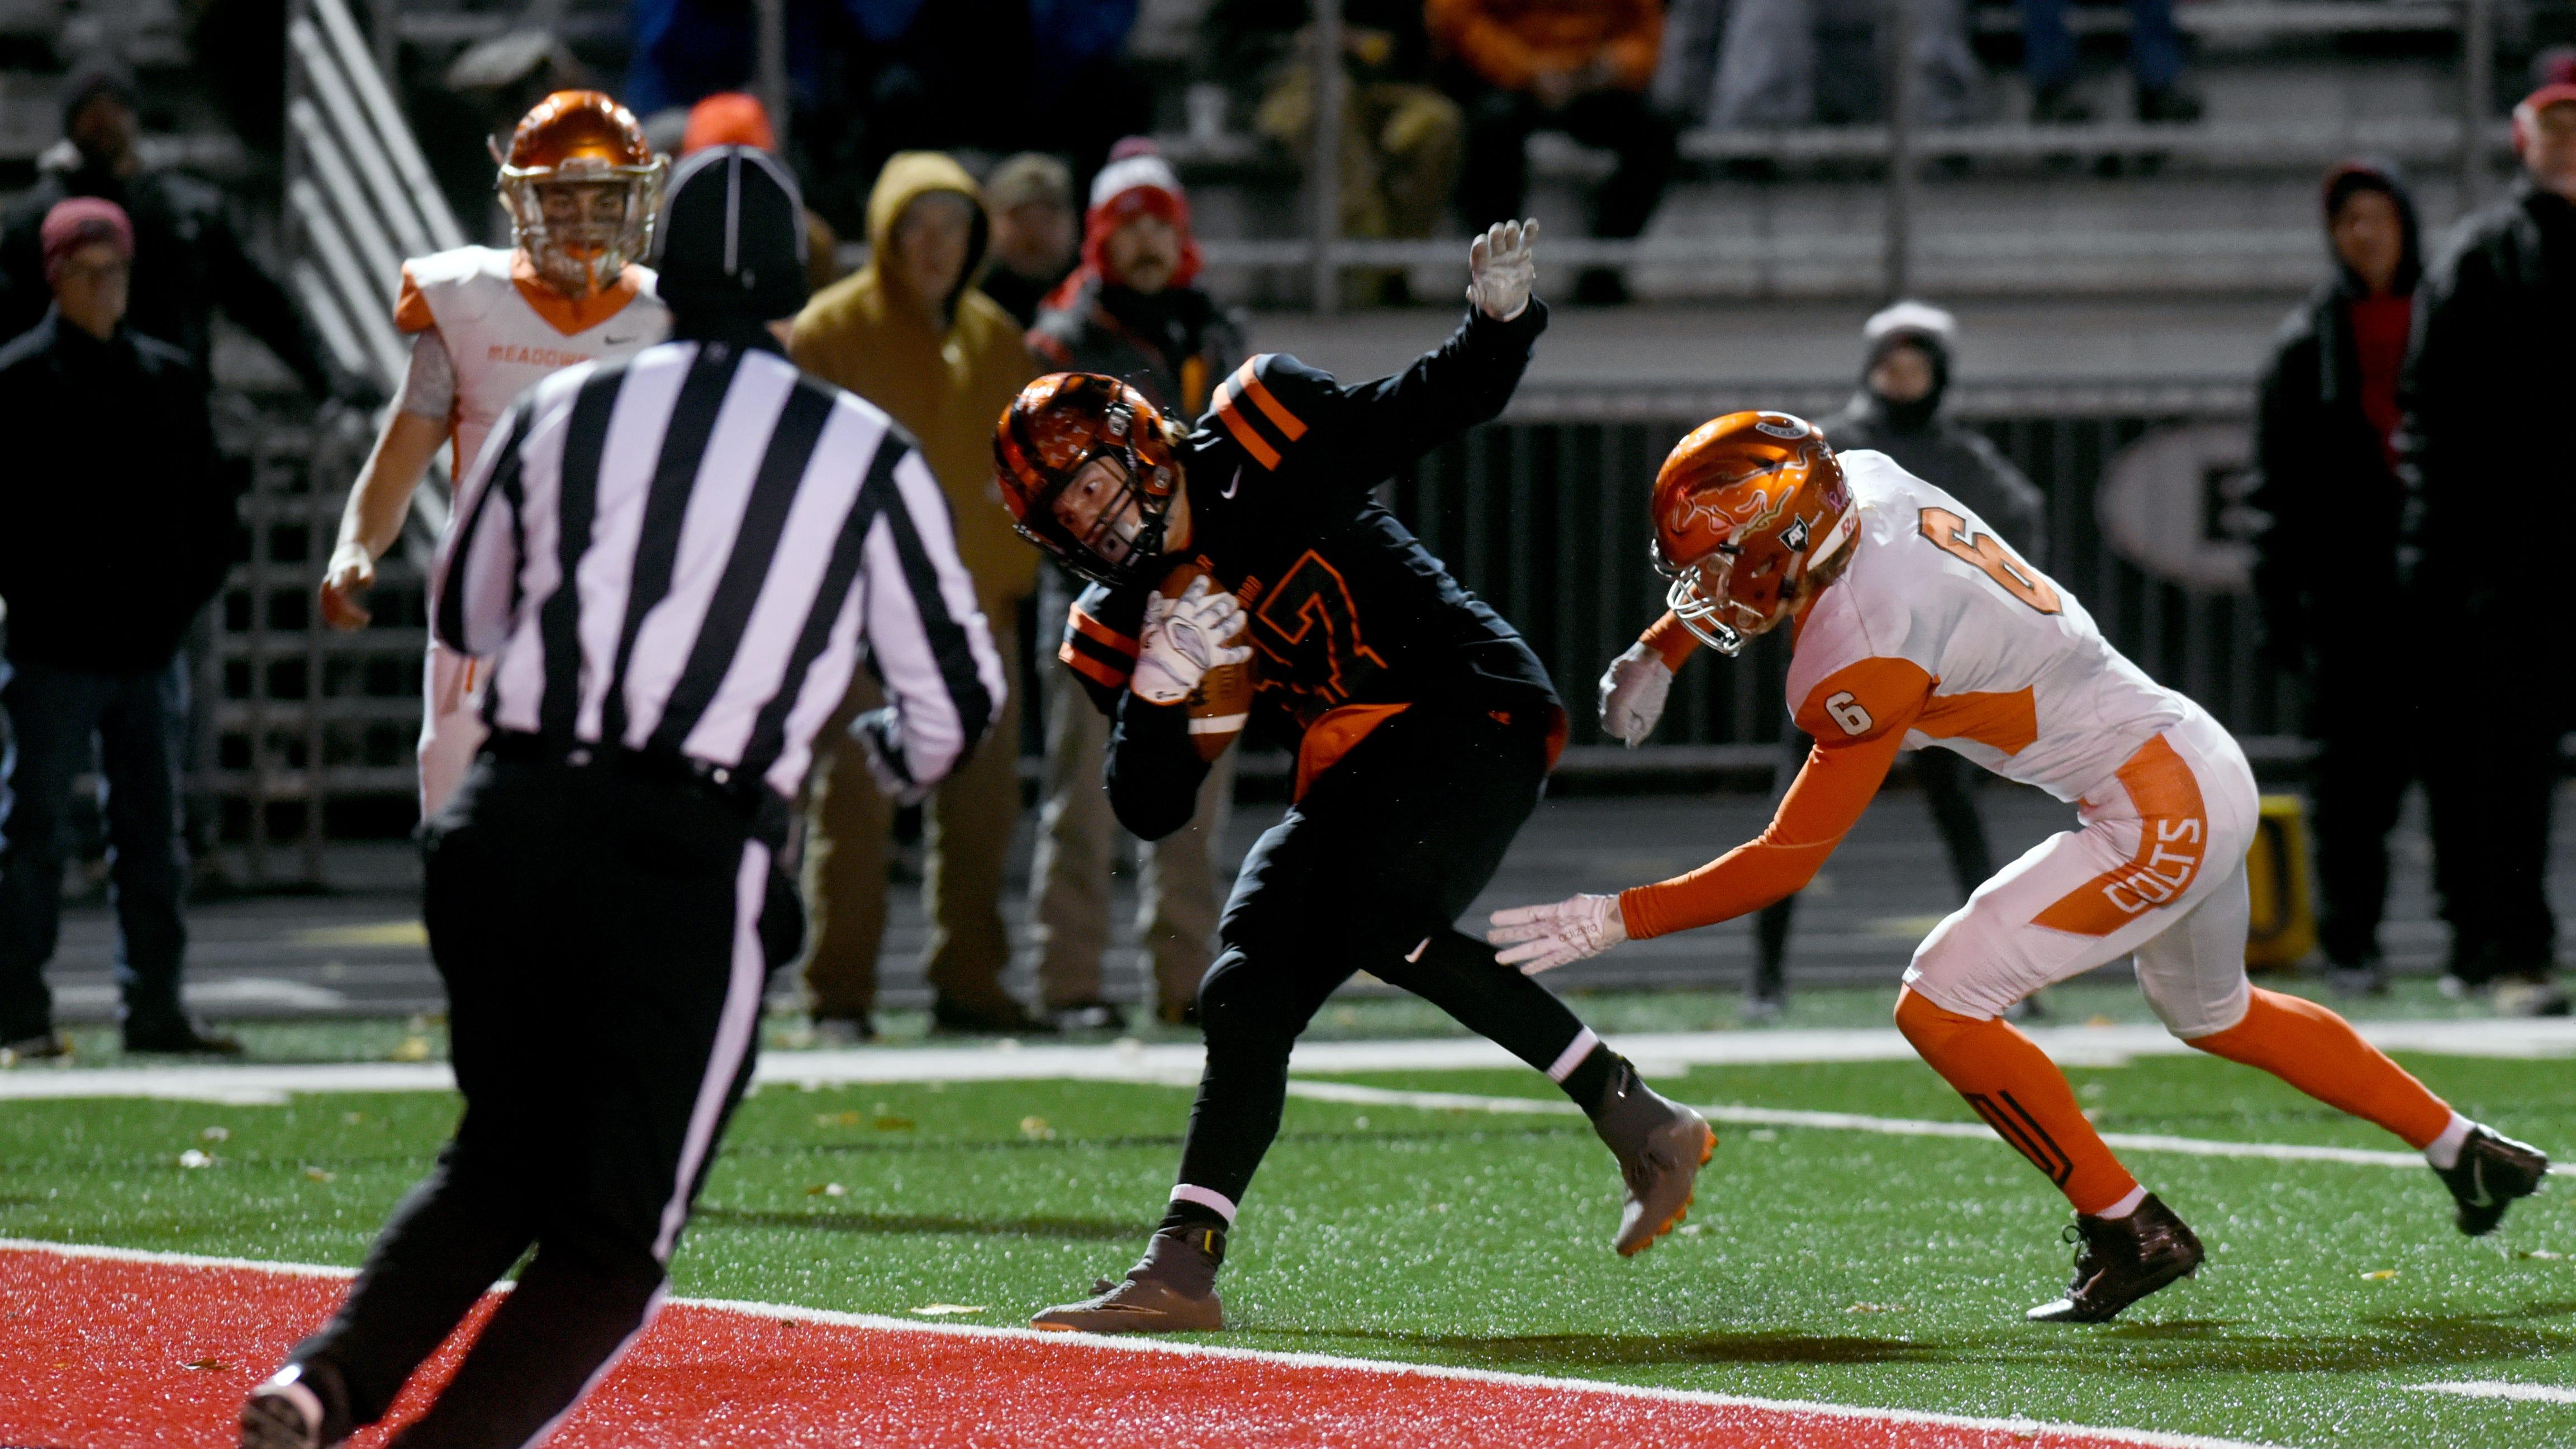 HS Football: Big plays propels Colts past Ridgewood